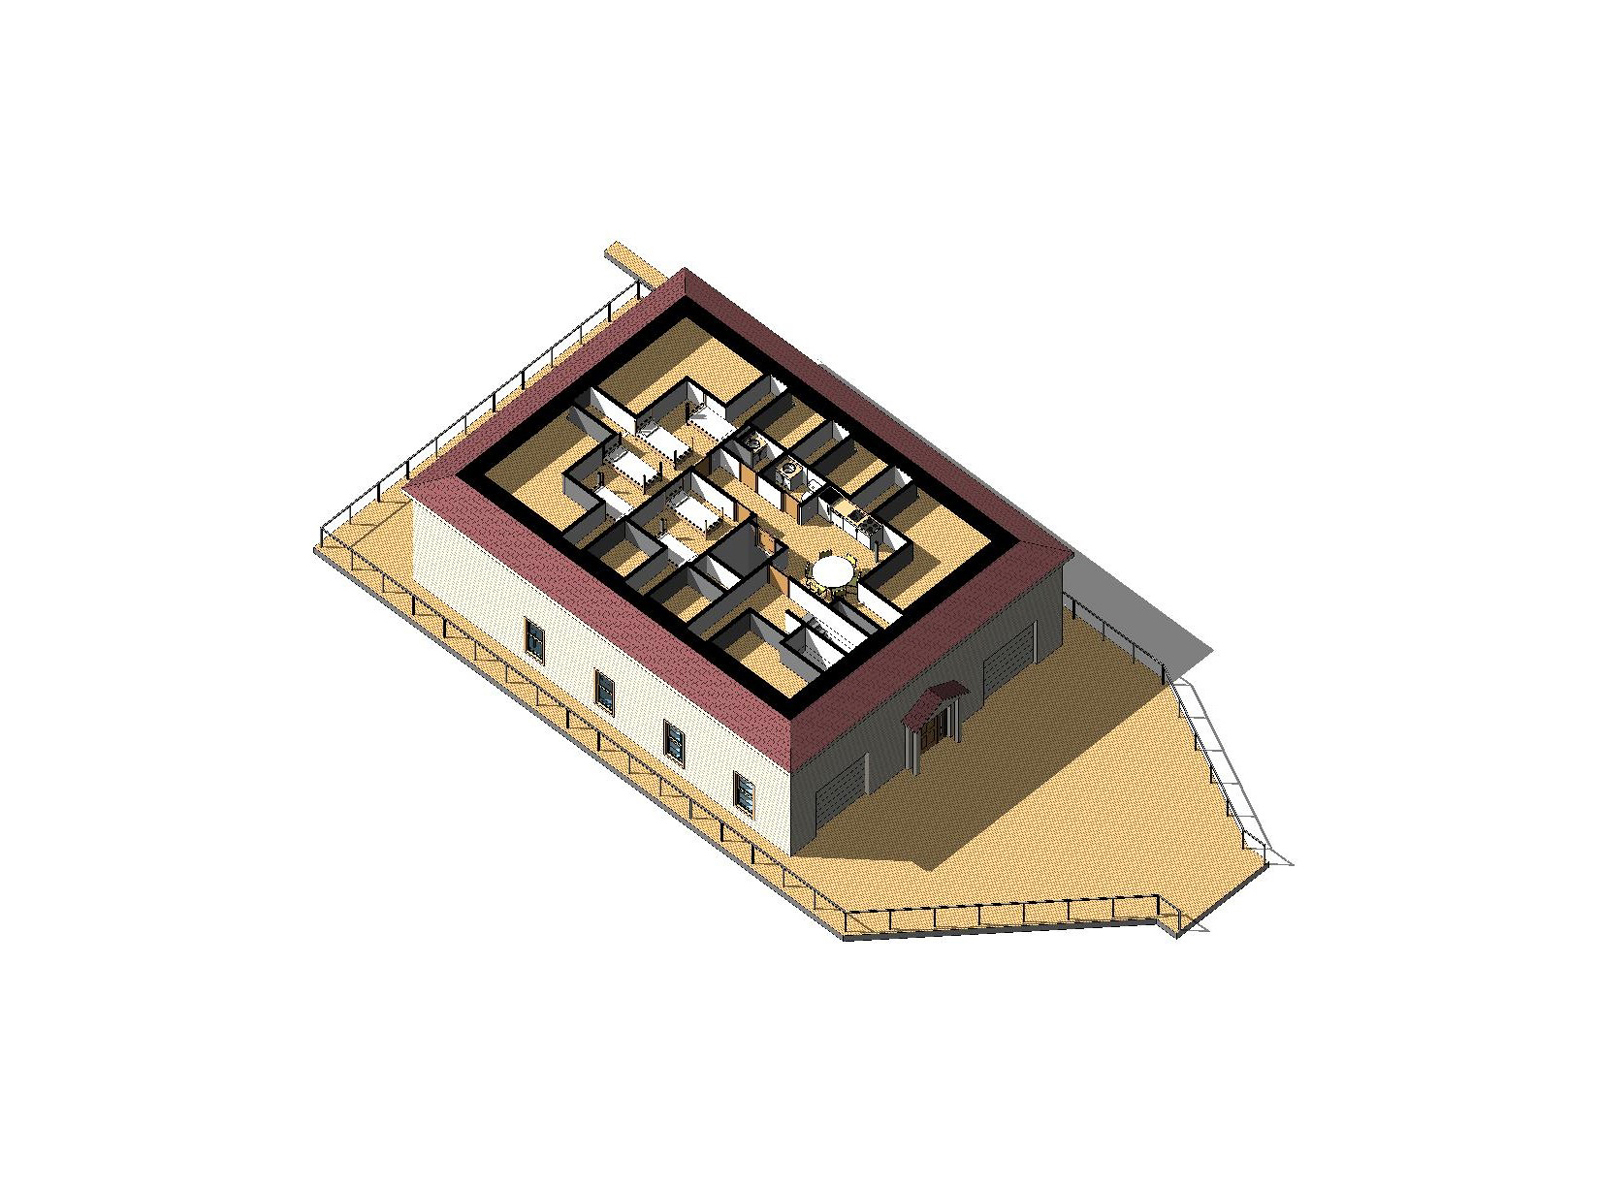 boathouse_isometric-02e.jpg